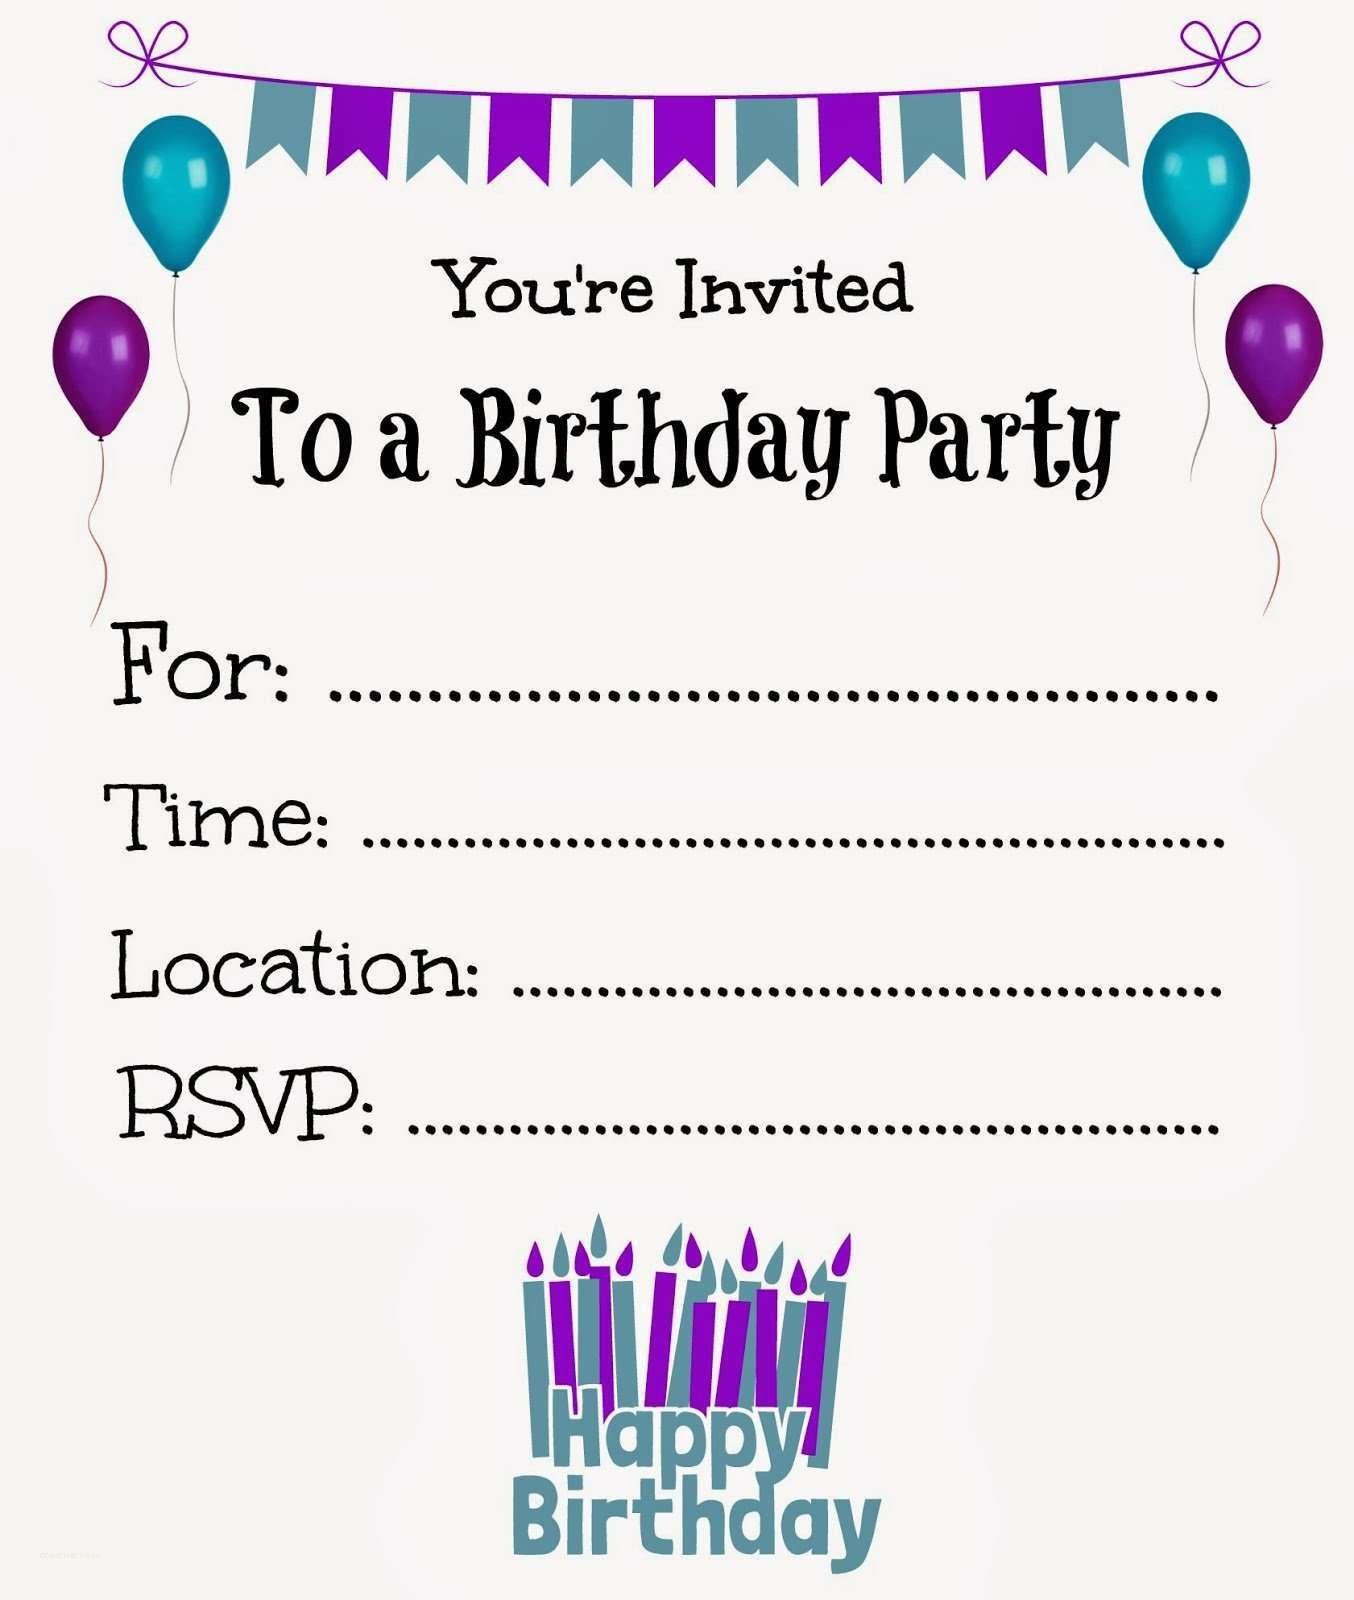 New Free Online Printable Birthday Party Invitations | Holiday - Birthday Party Invitations Online Free Printable